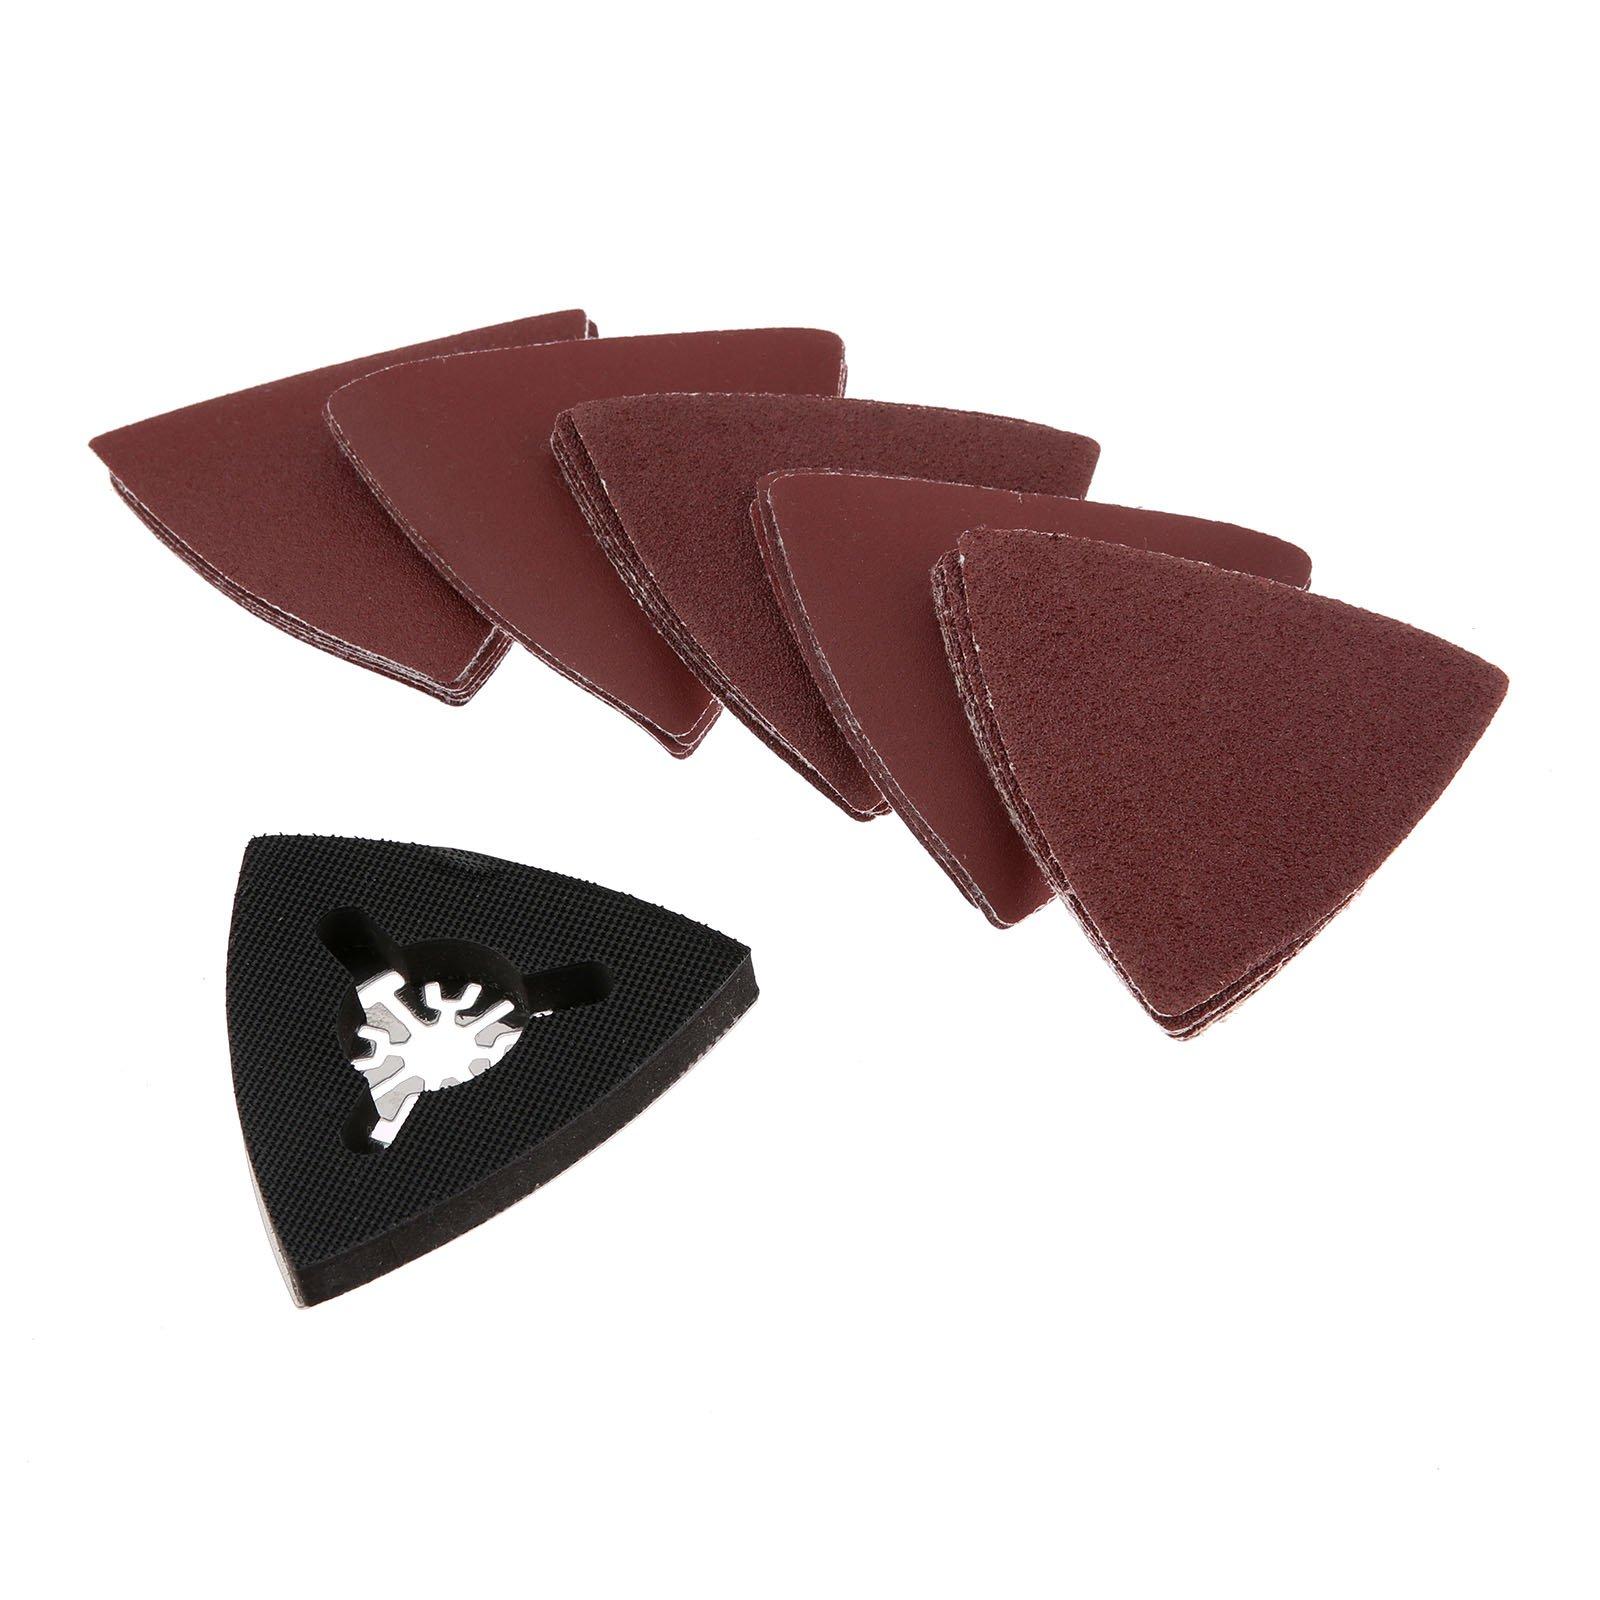 26Pcs Sanding Paper & Triangular Sanding Pad Fits For Fein Dremel Multifunction Oscillating Power Multi Tools